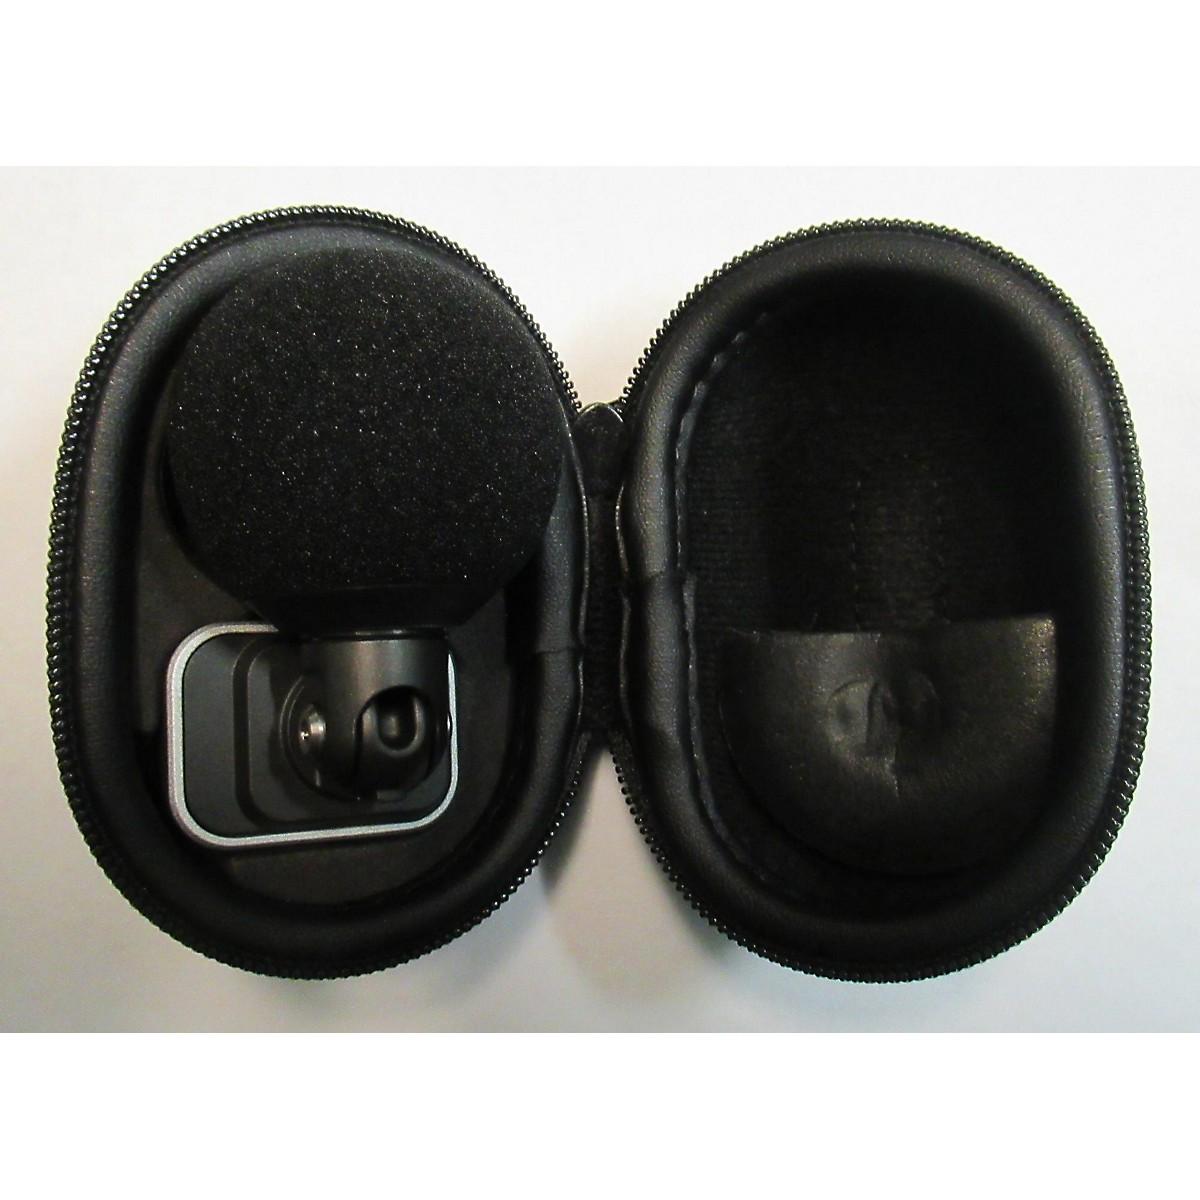 Shure MV88 USB Microphone